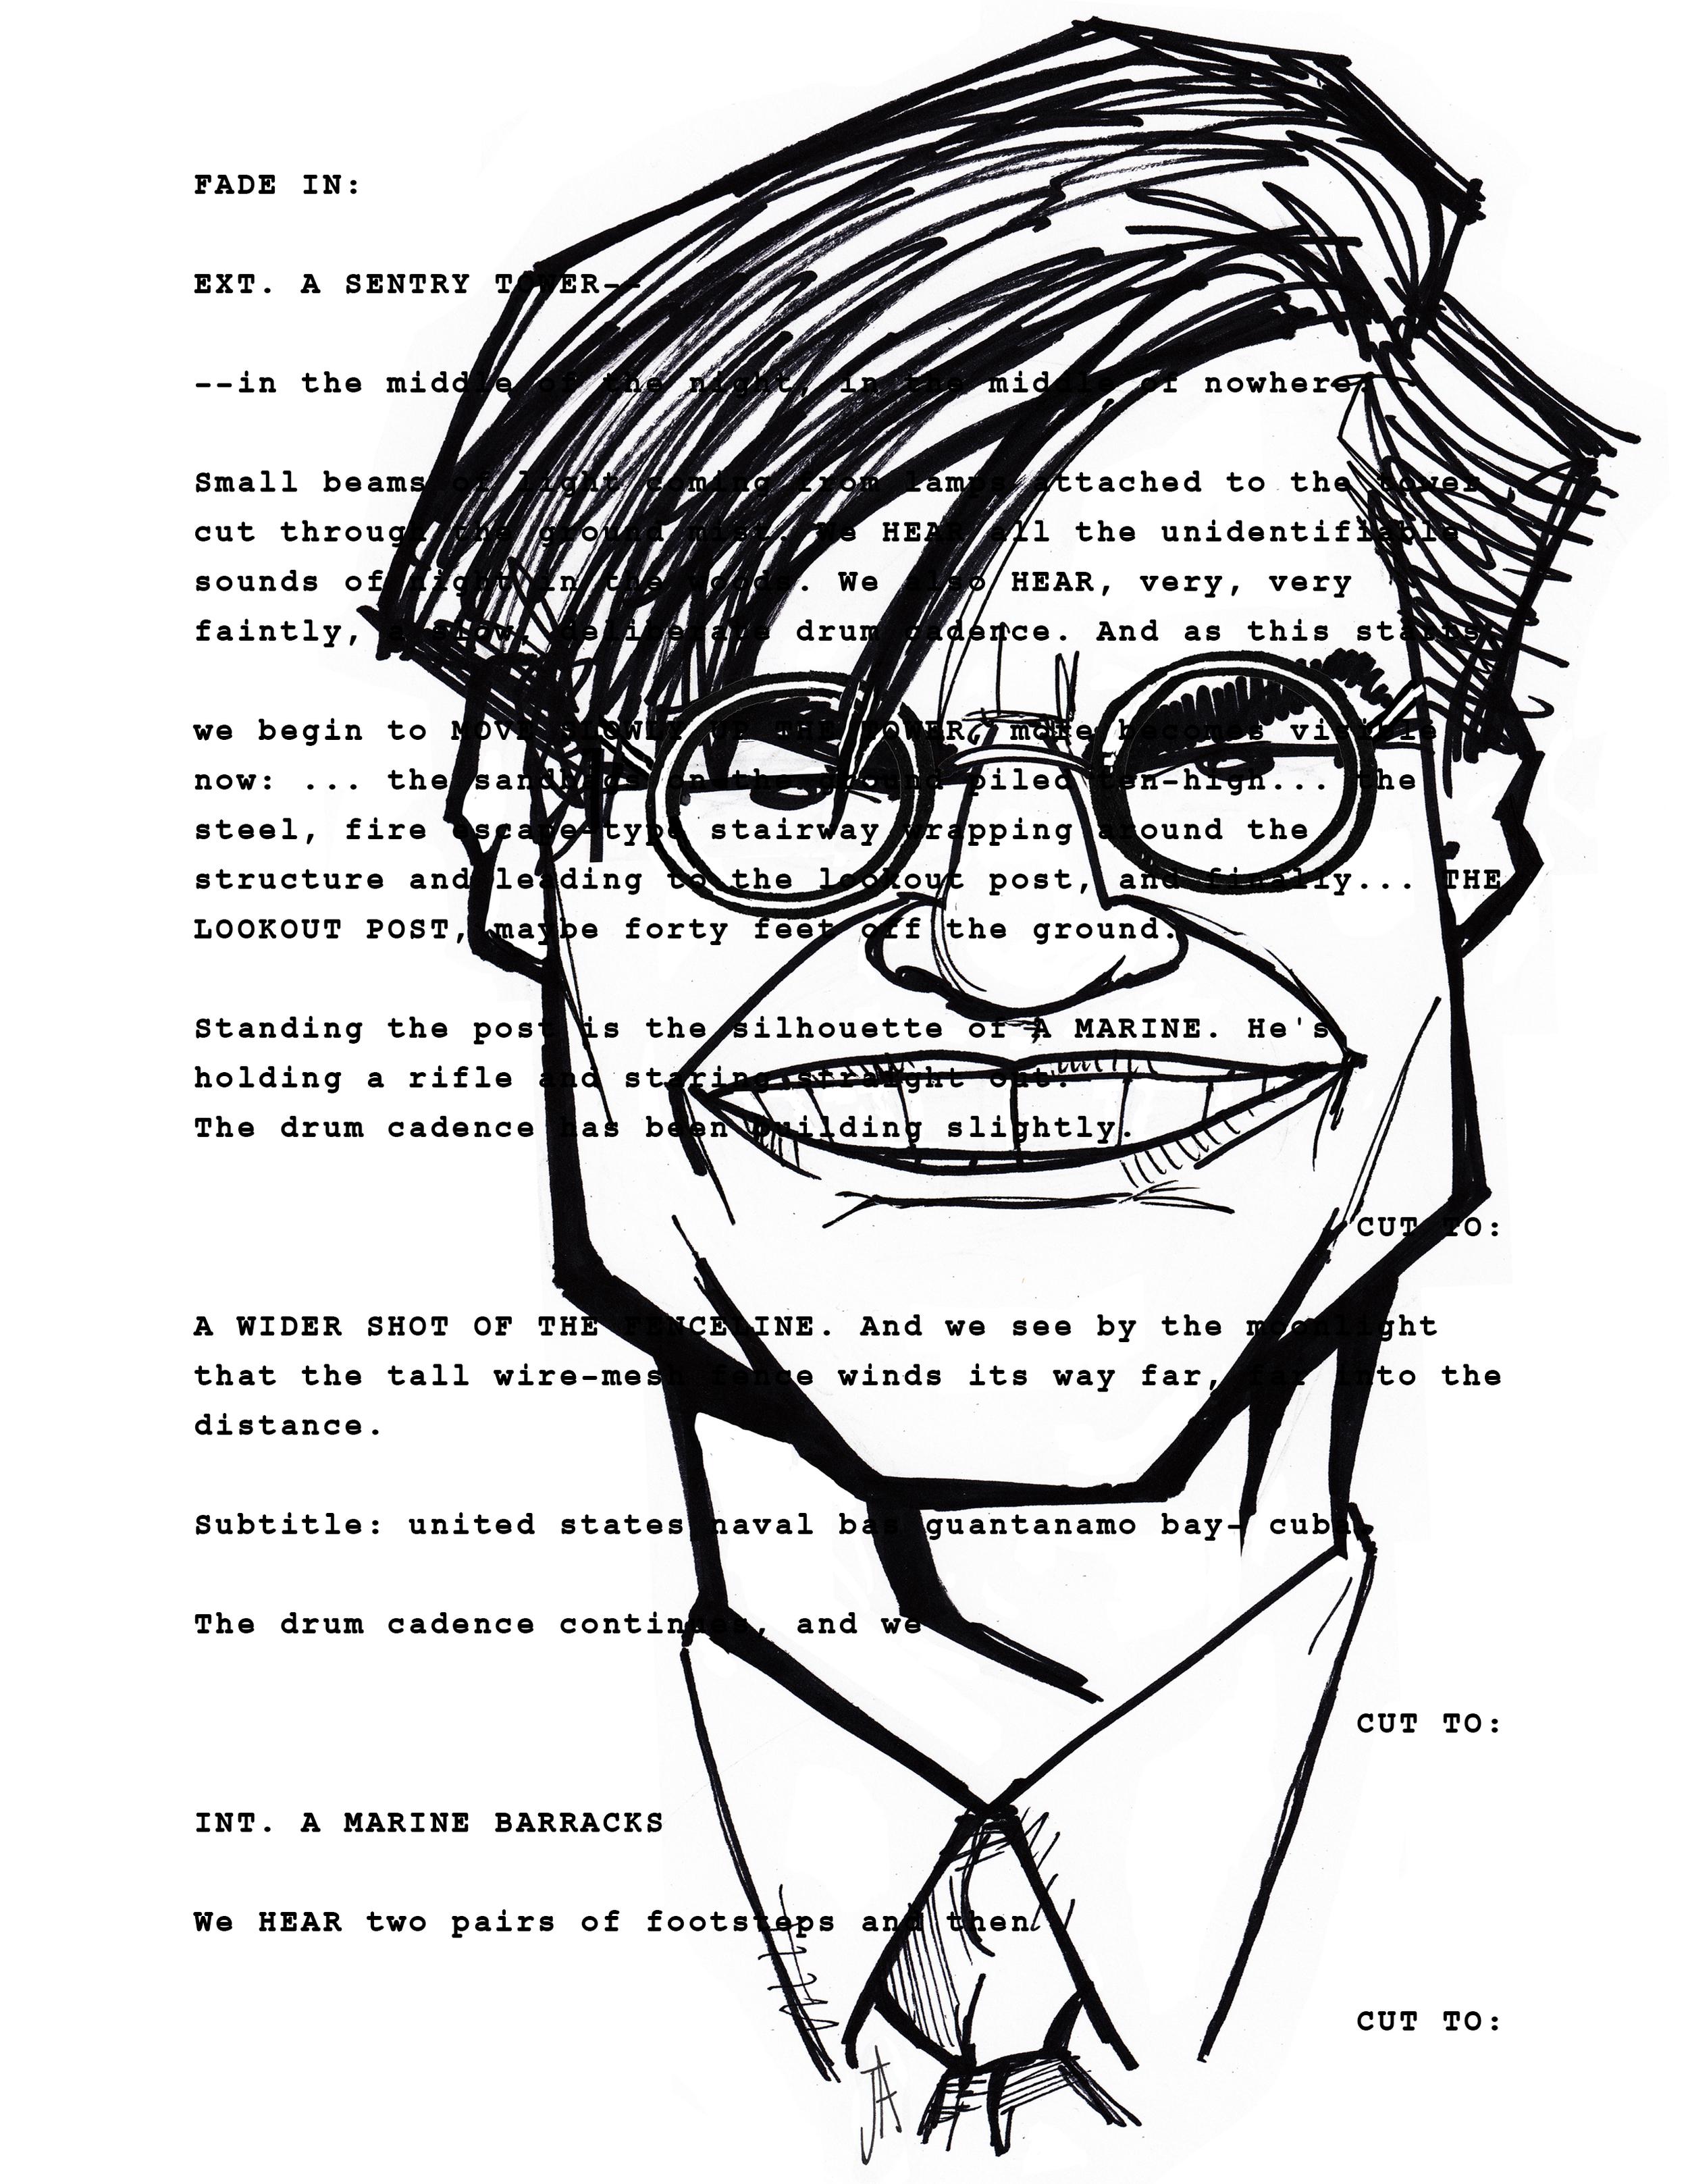 Aaron Sorkin / A Few Good Men